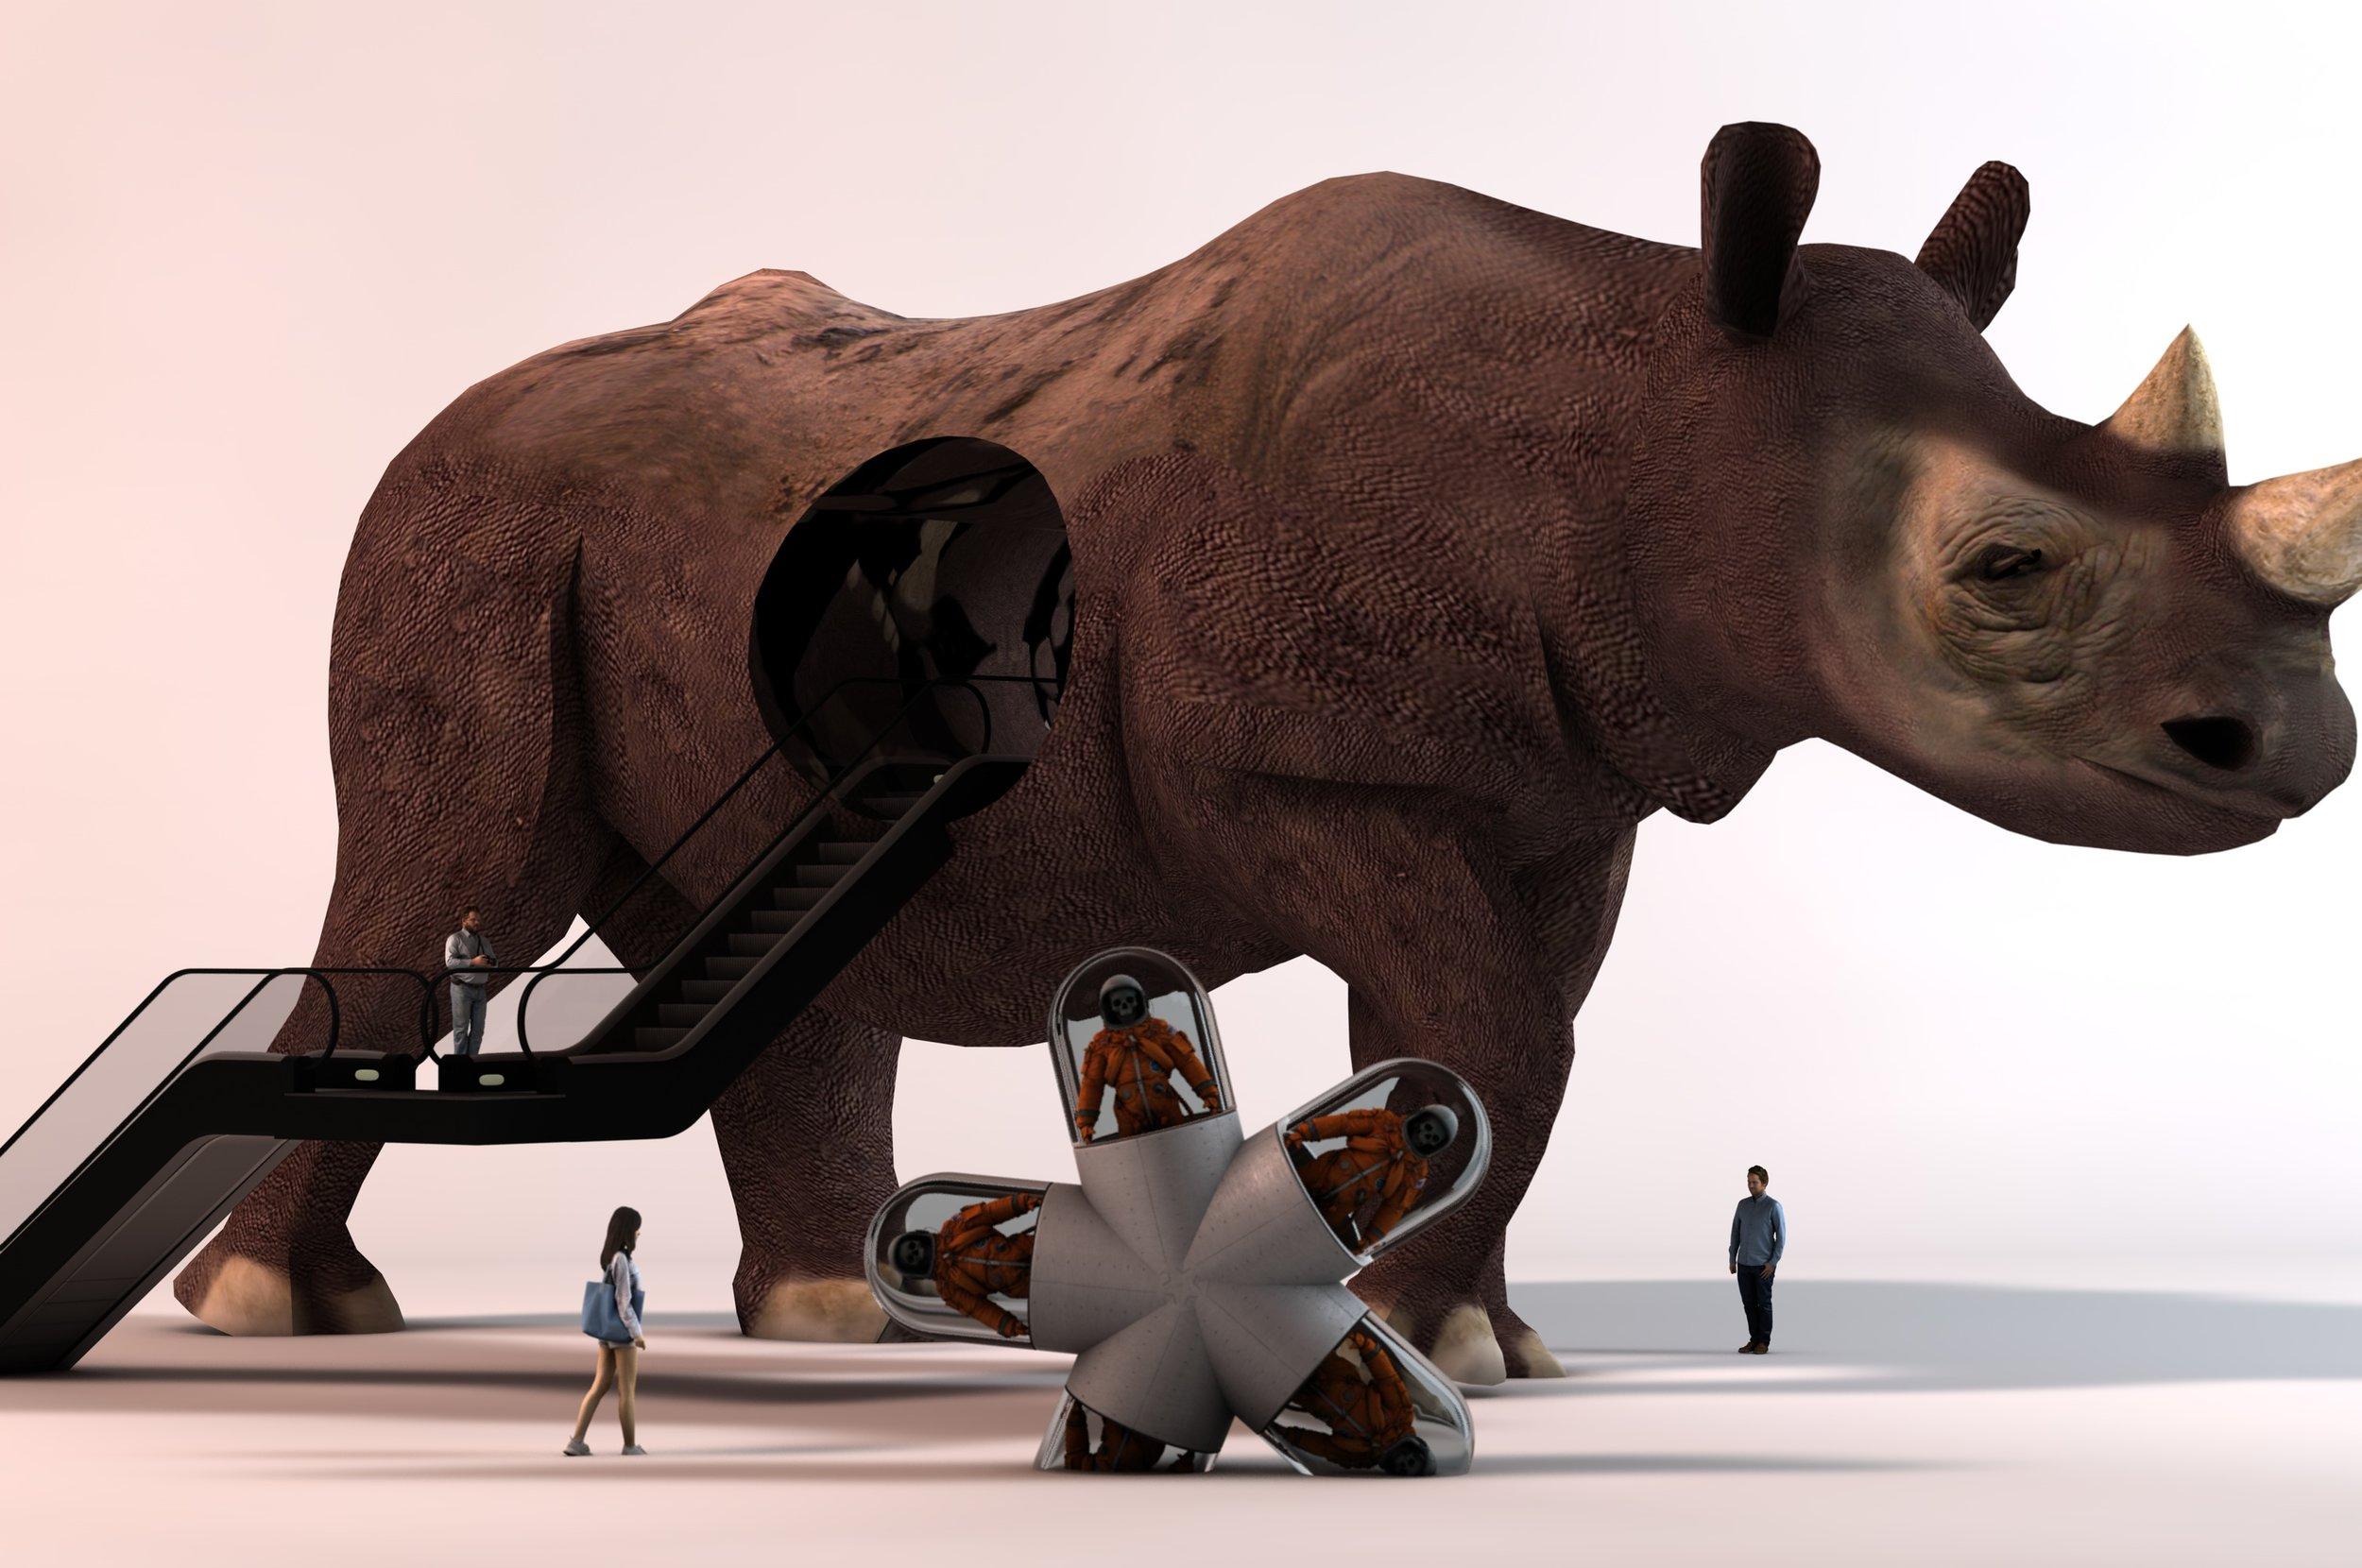 Rhino Escalator